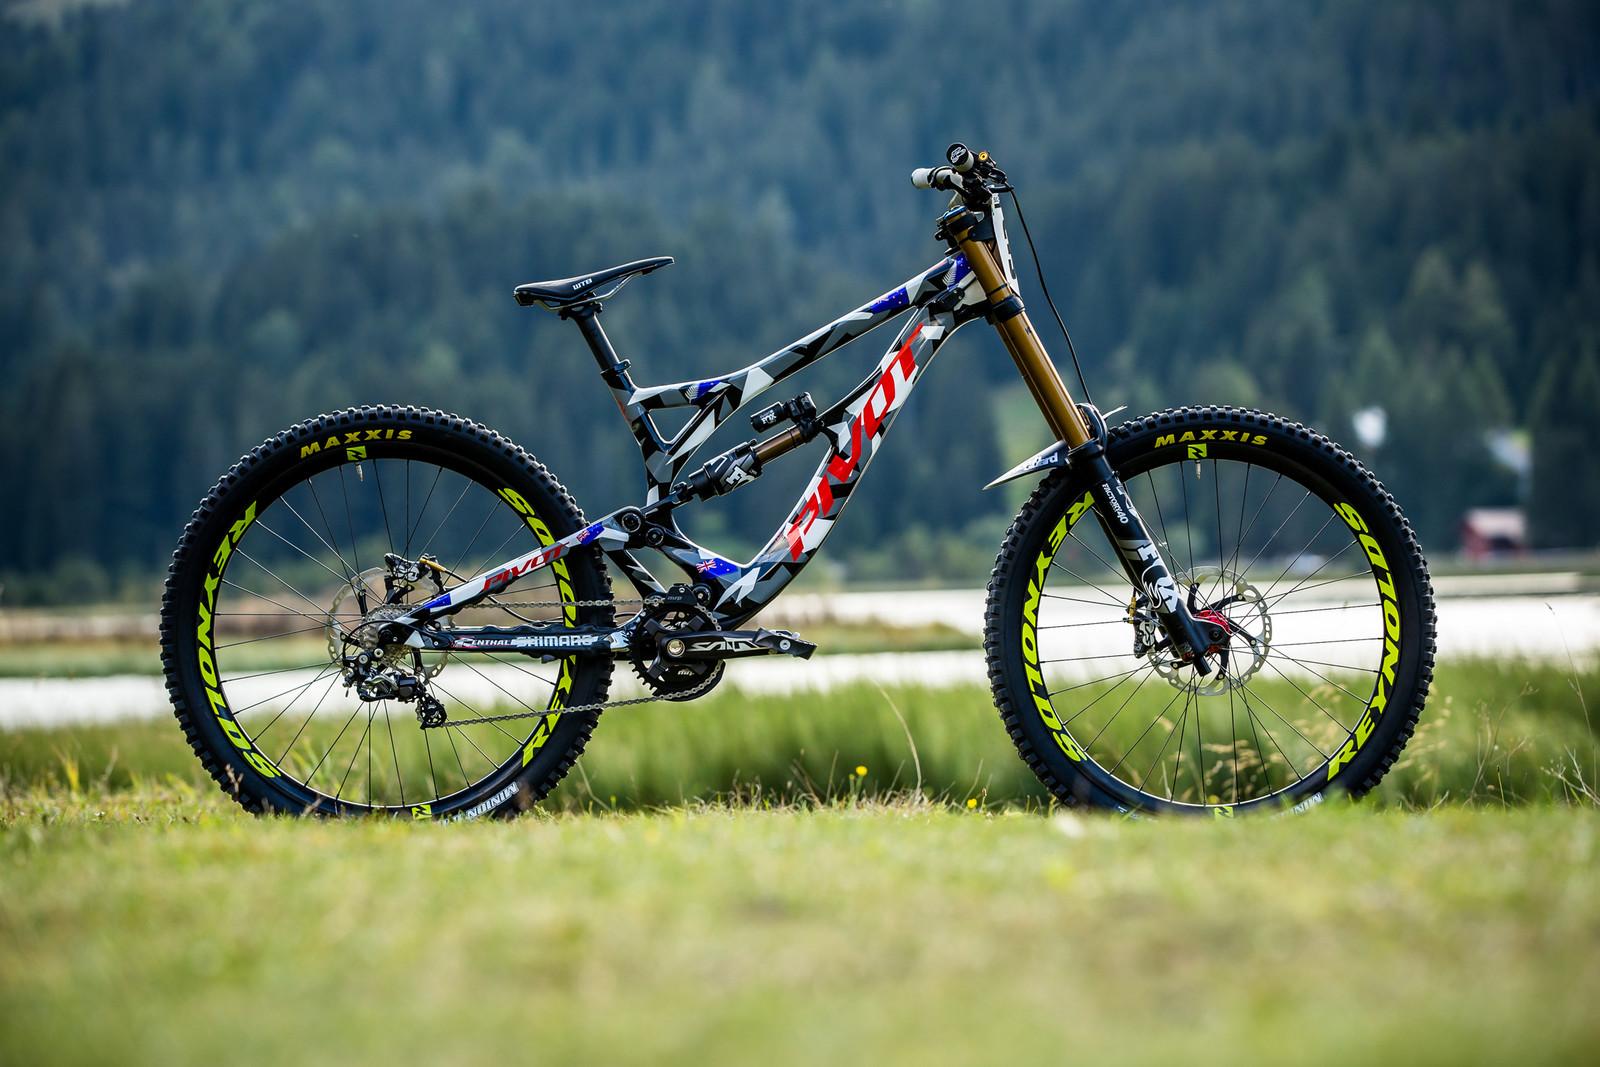 WORLD CHAMPS BIKE - Eddie Masters' Pivot Phoenix - WORLD CHAMPS BIKE - Eddie Masters' Pivot Phoenix - Mountain Biking Pictures - Vital MTB